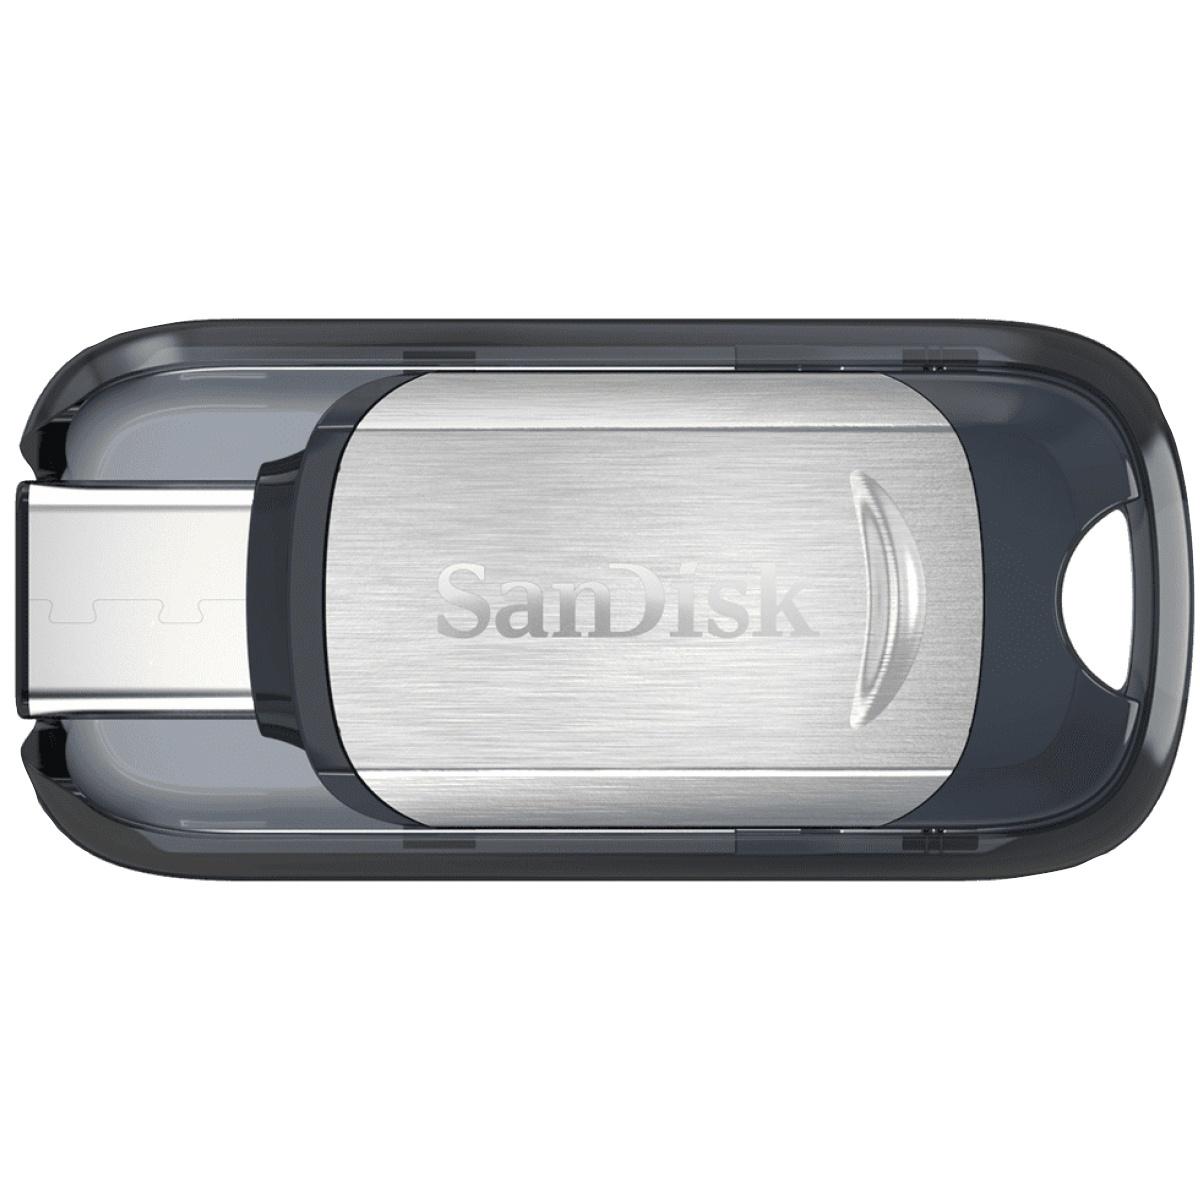 SanDisk Ultra 16 GB USB-Stick Type-C